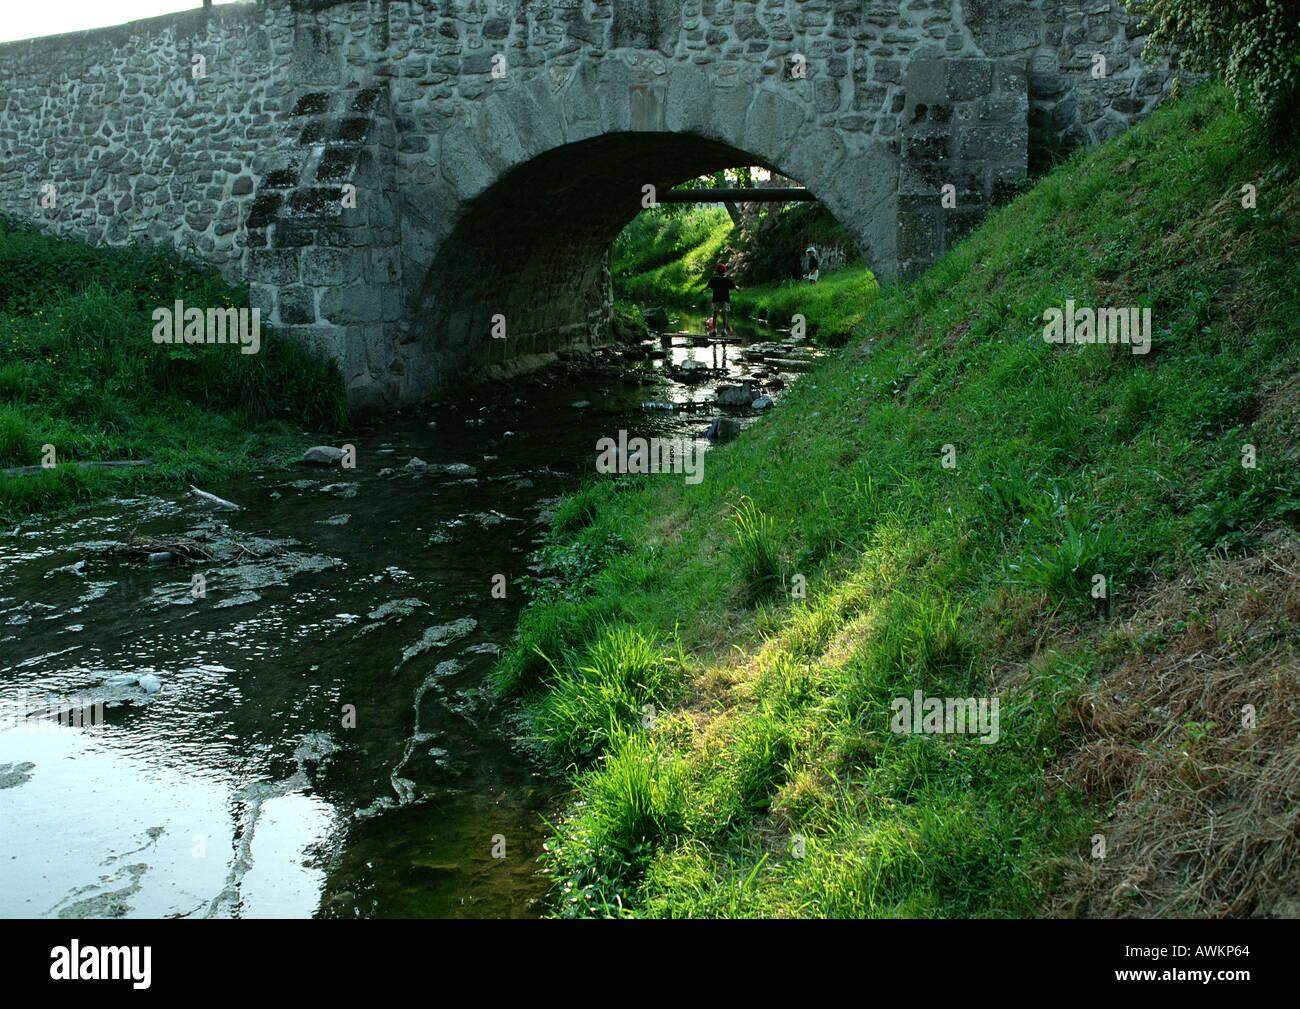 Polluted water running under bridge - Stock Image